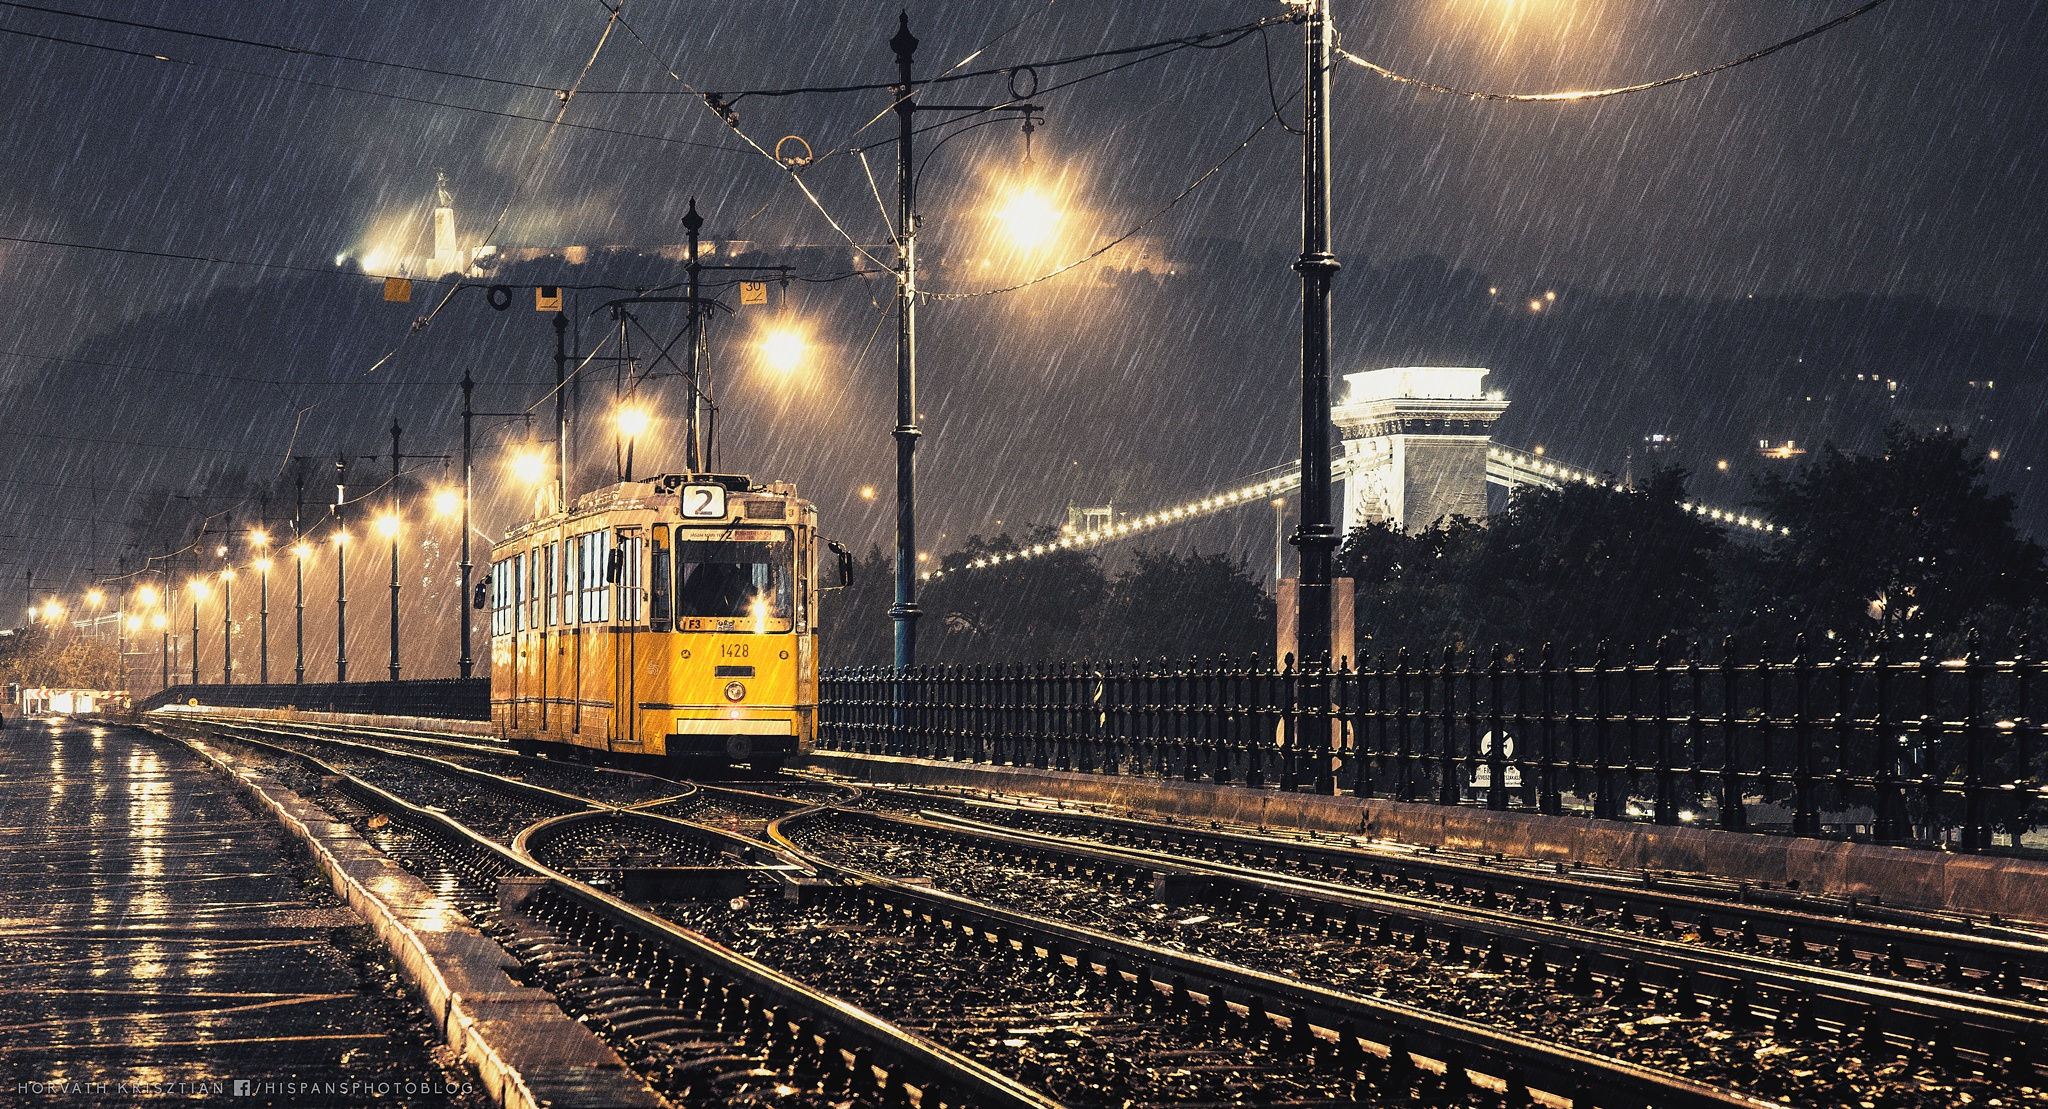 Lonely tram in the rain by hispan